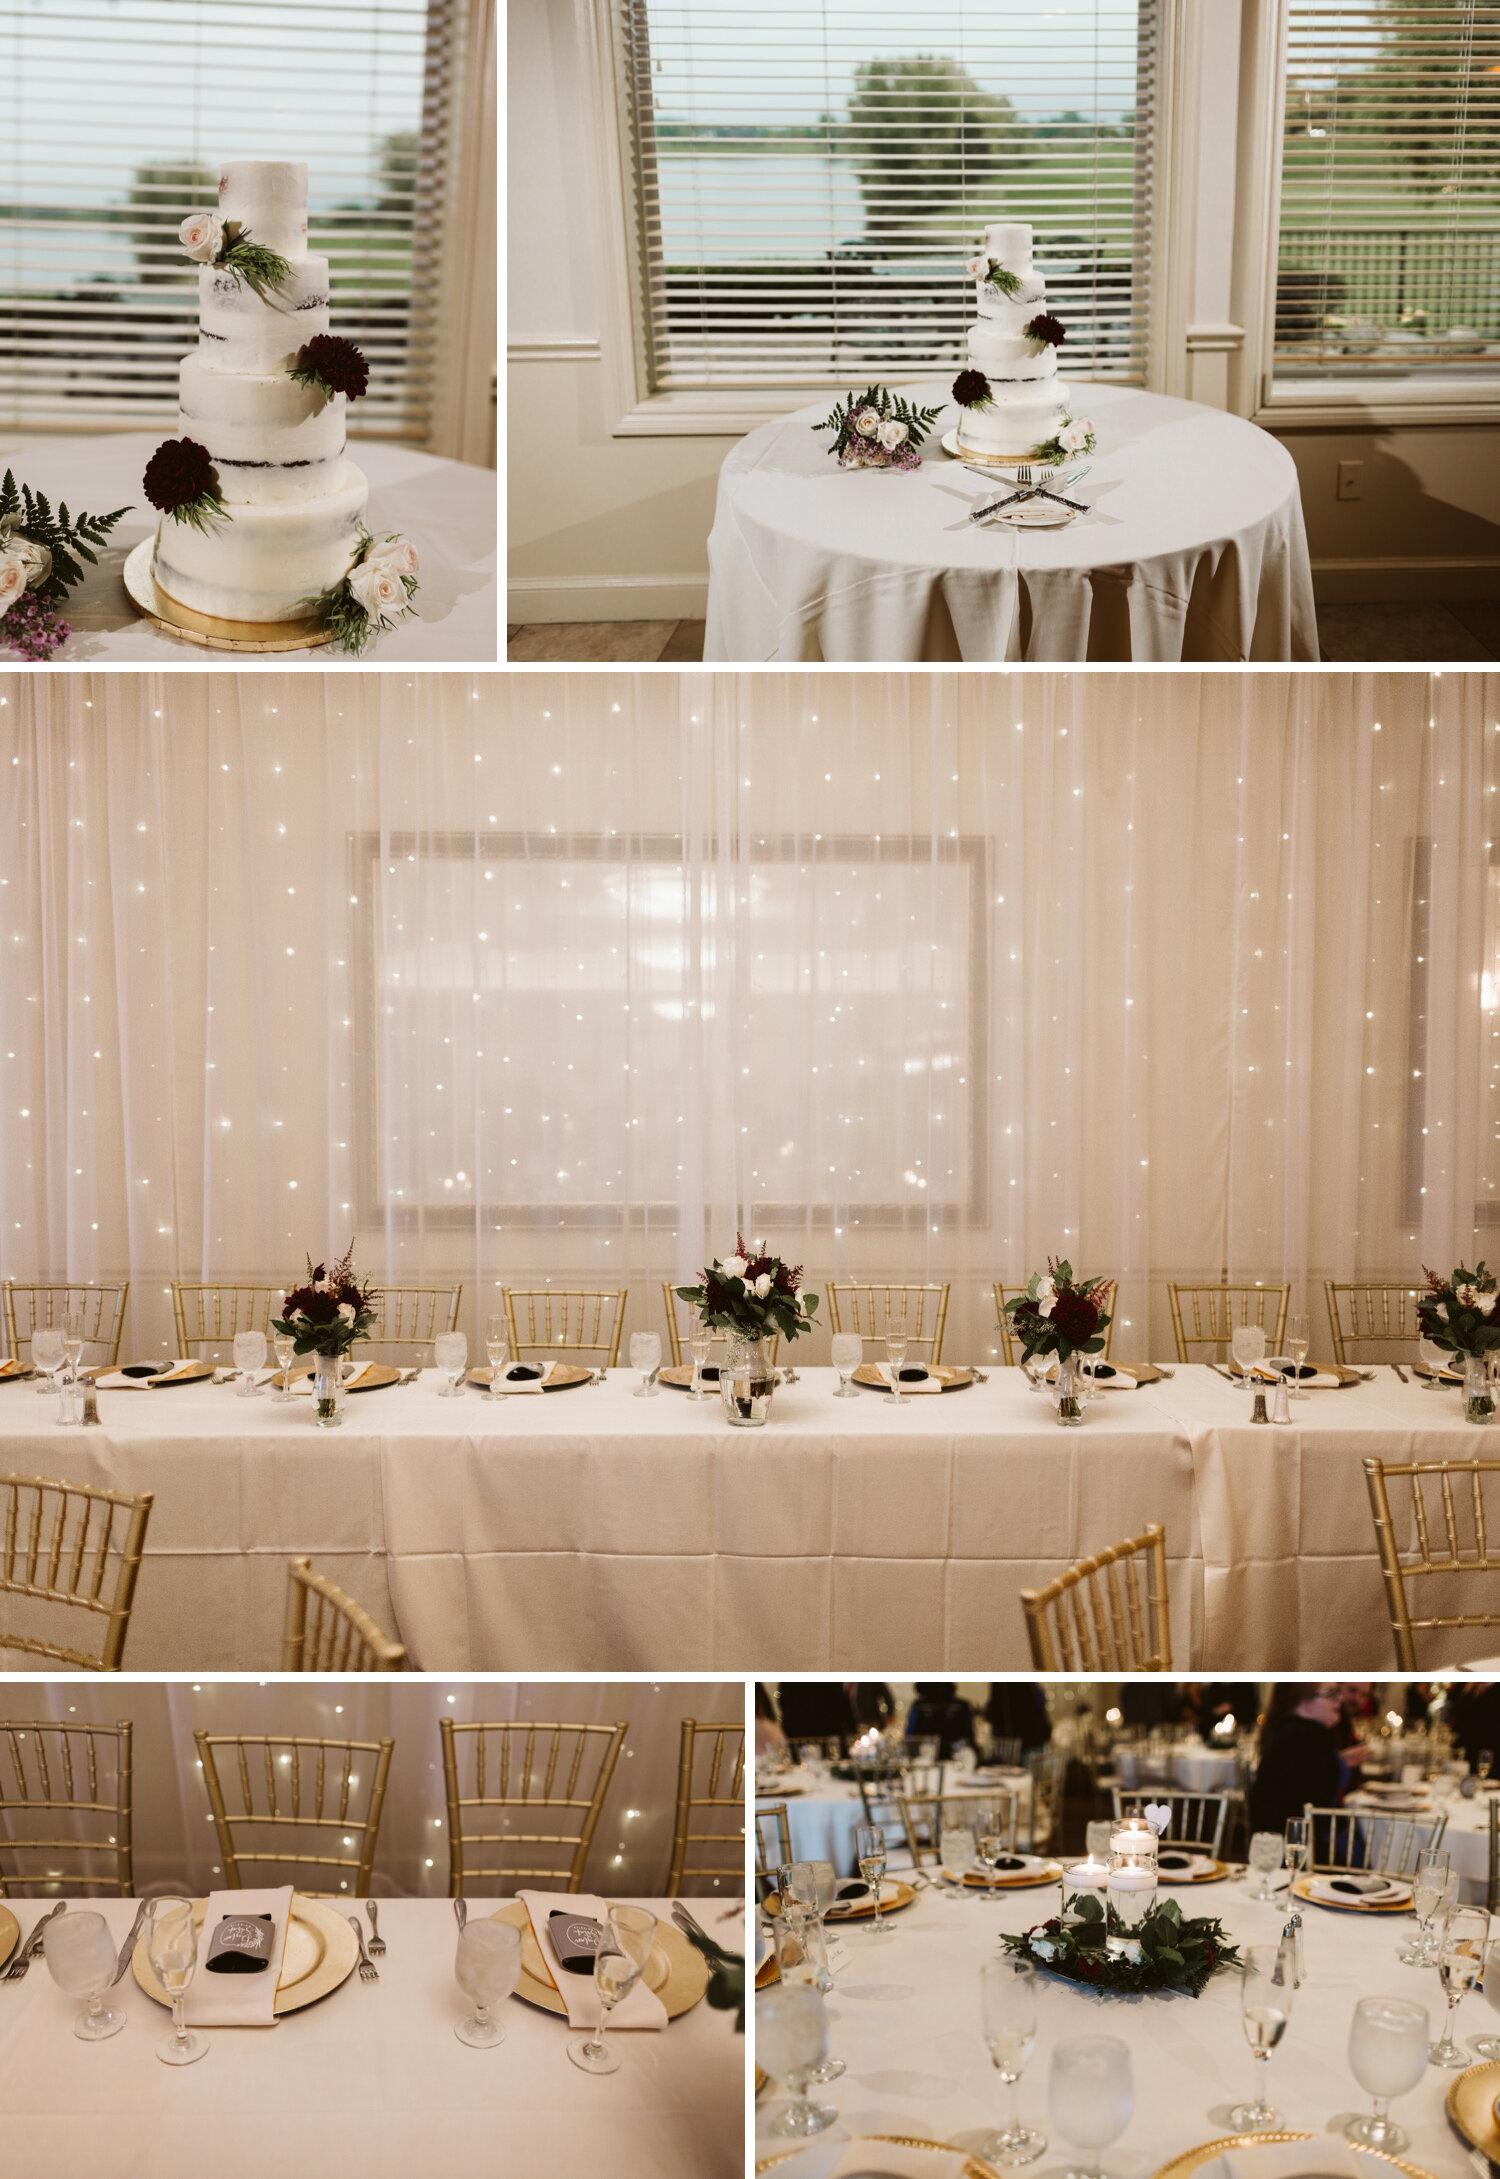 Reception setting photos